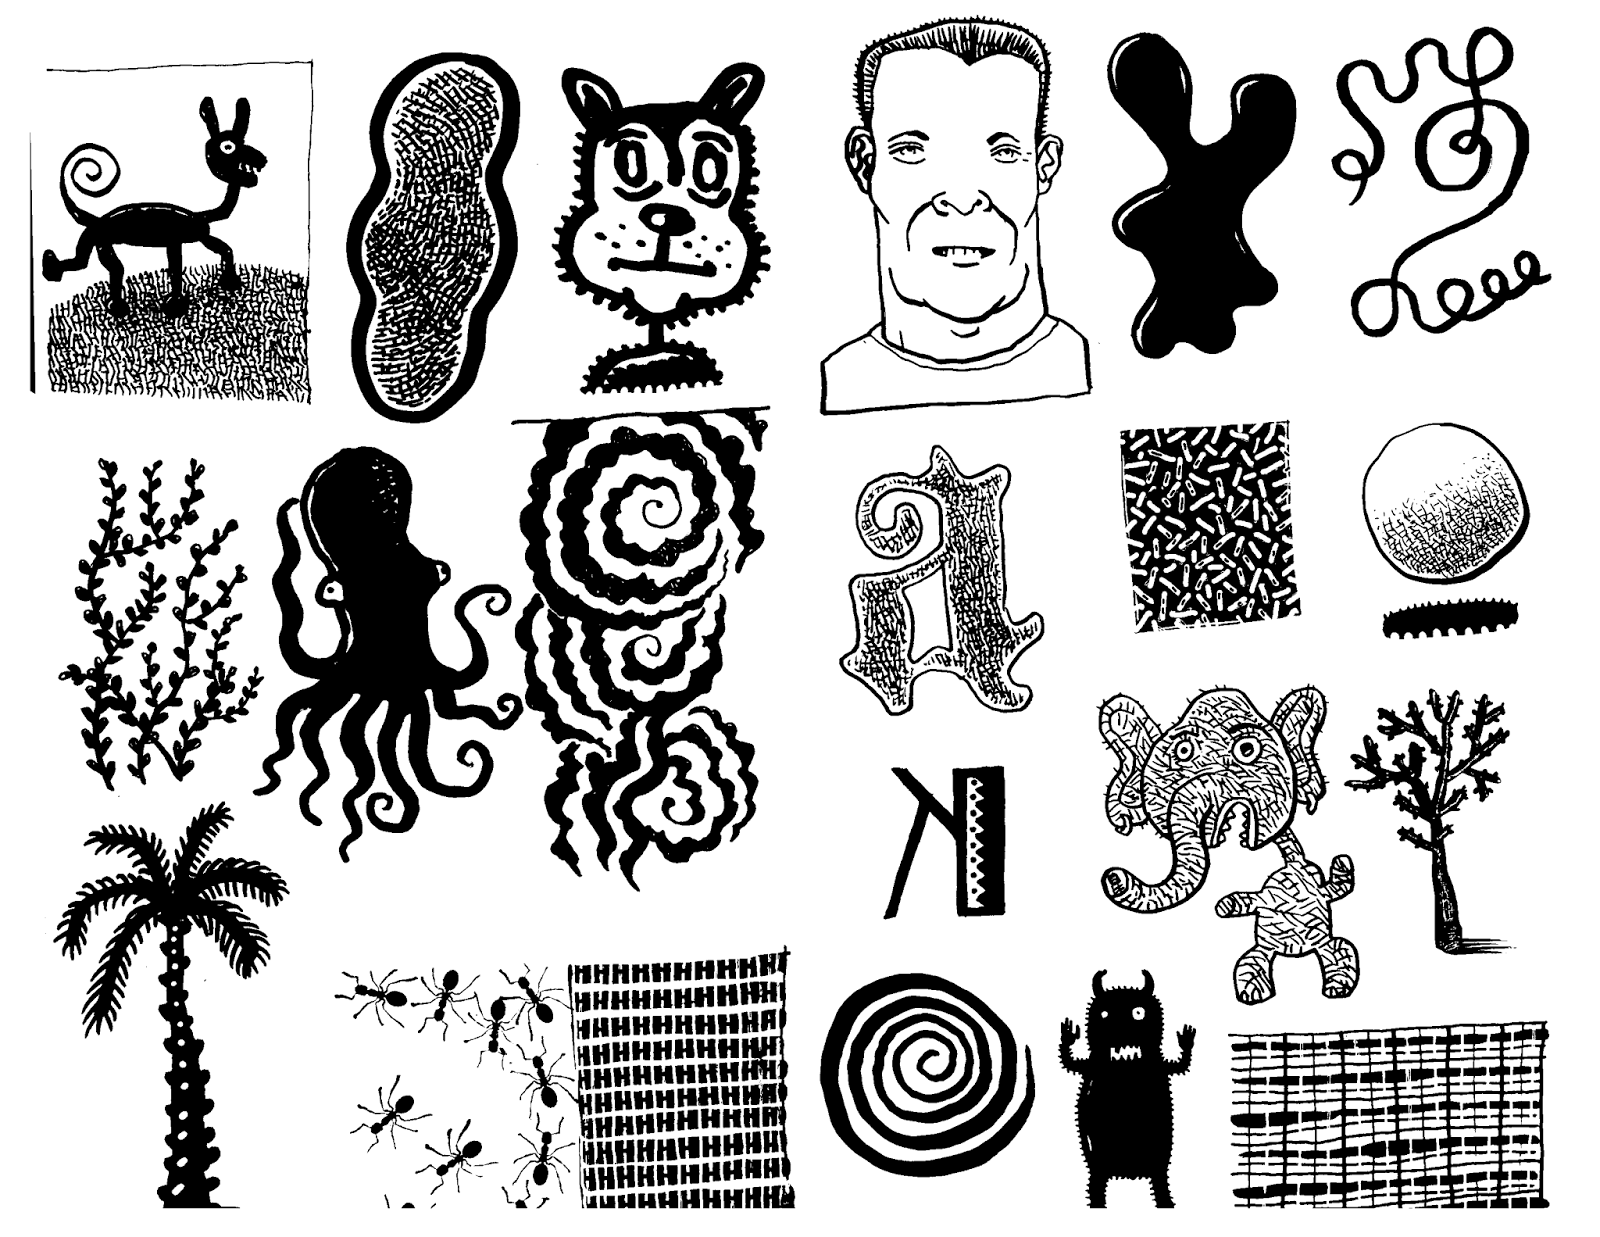 Don Moyer Sketchbook: January 2014